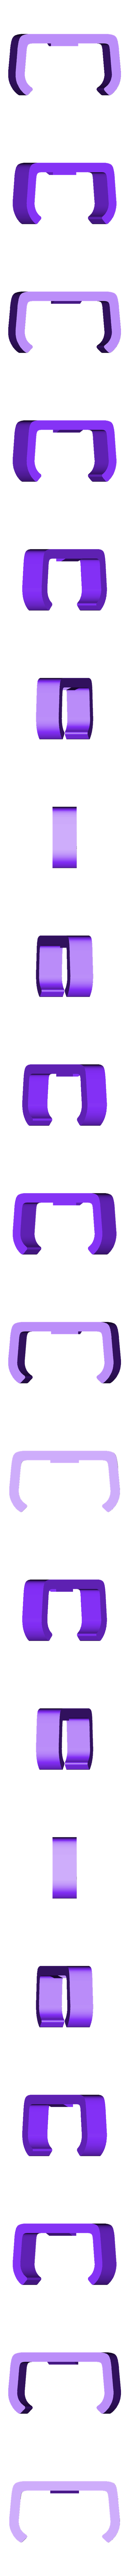 Tiko_Upper_Motor_Mount_Clip_-_04.stl Download free STL file Tiko Motor Mount Tensioner Clips • 3D printable template, WalterHsiao